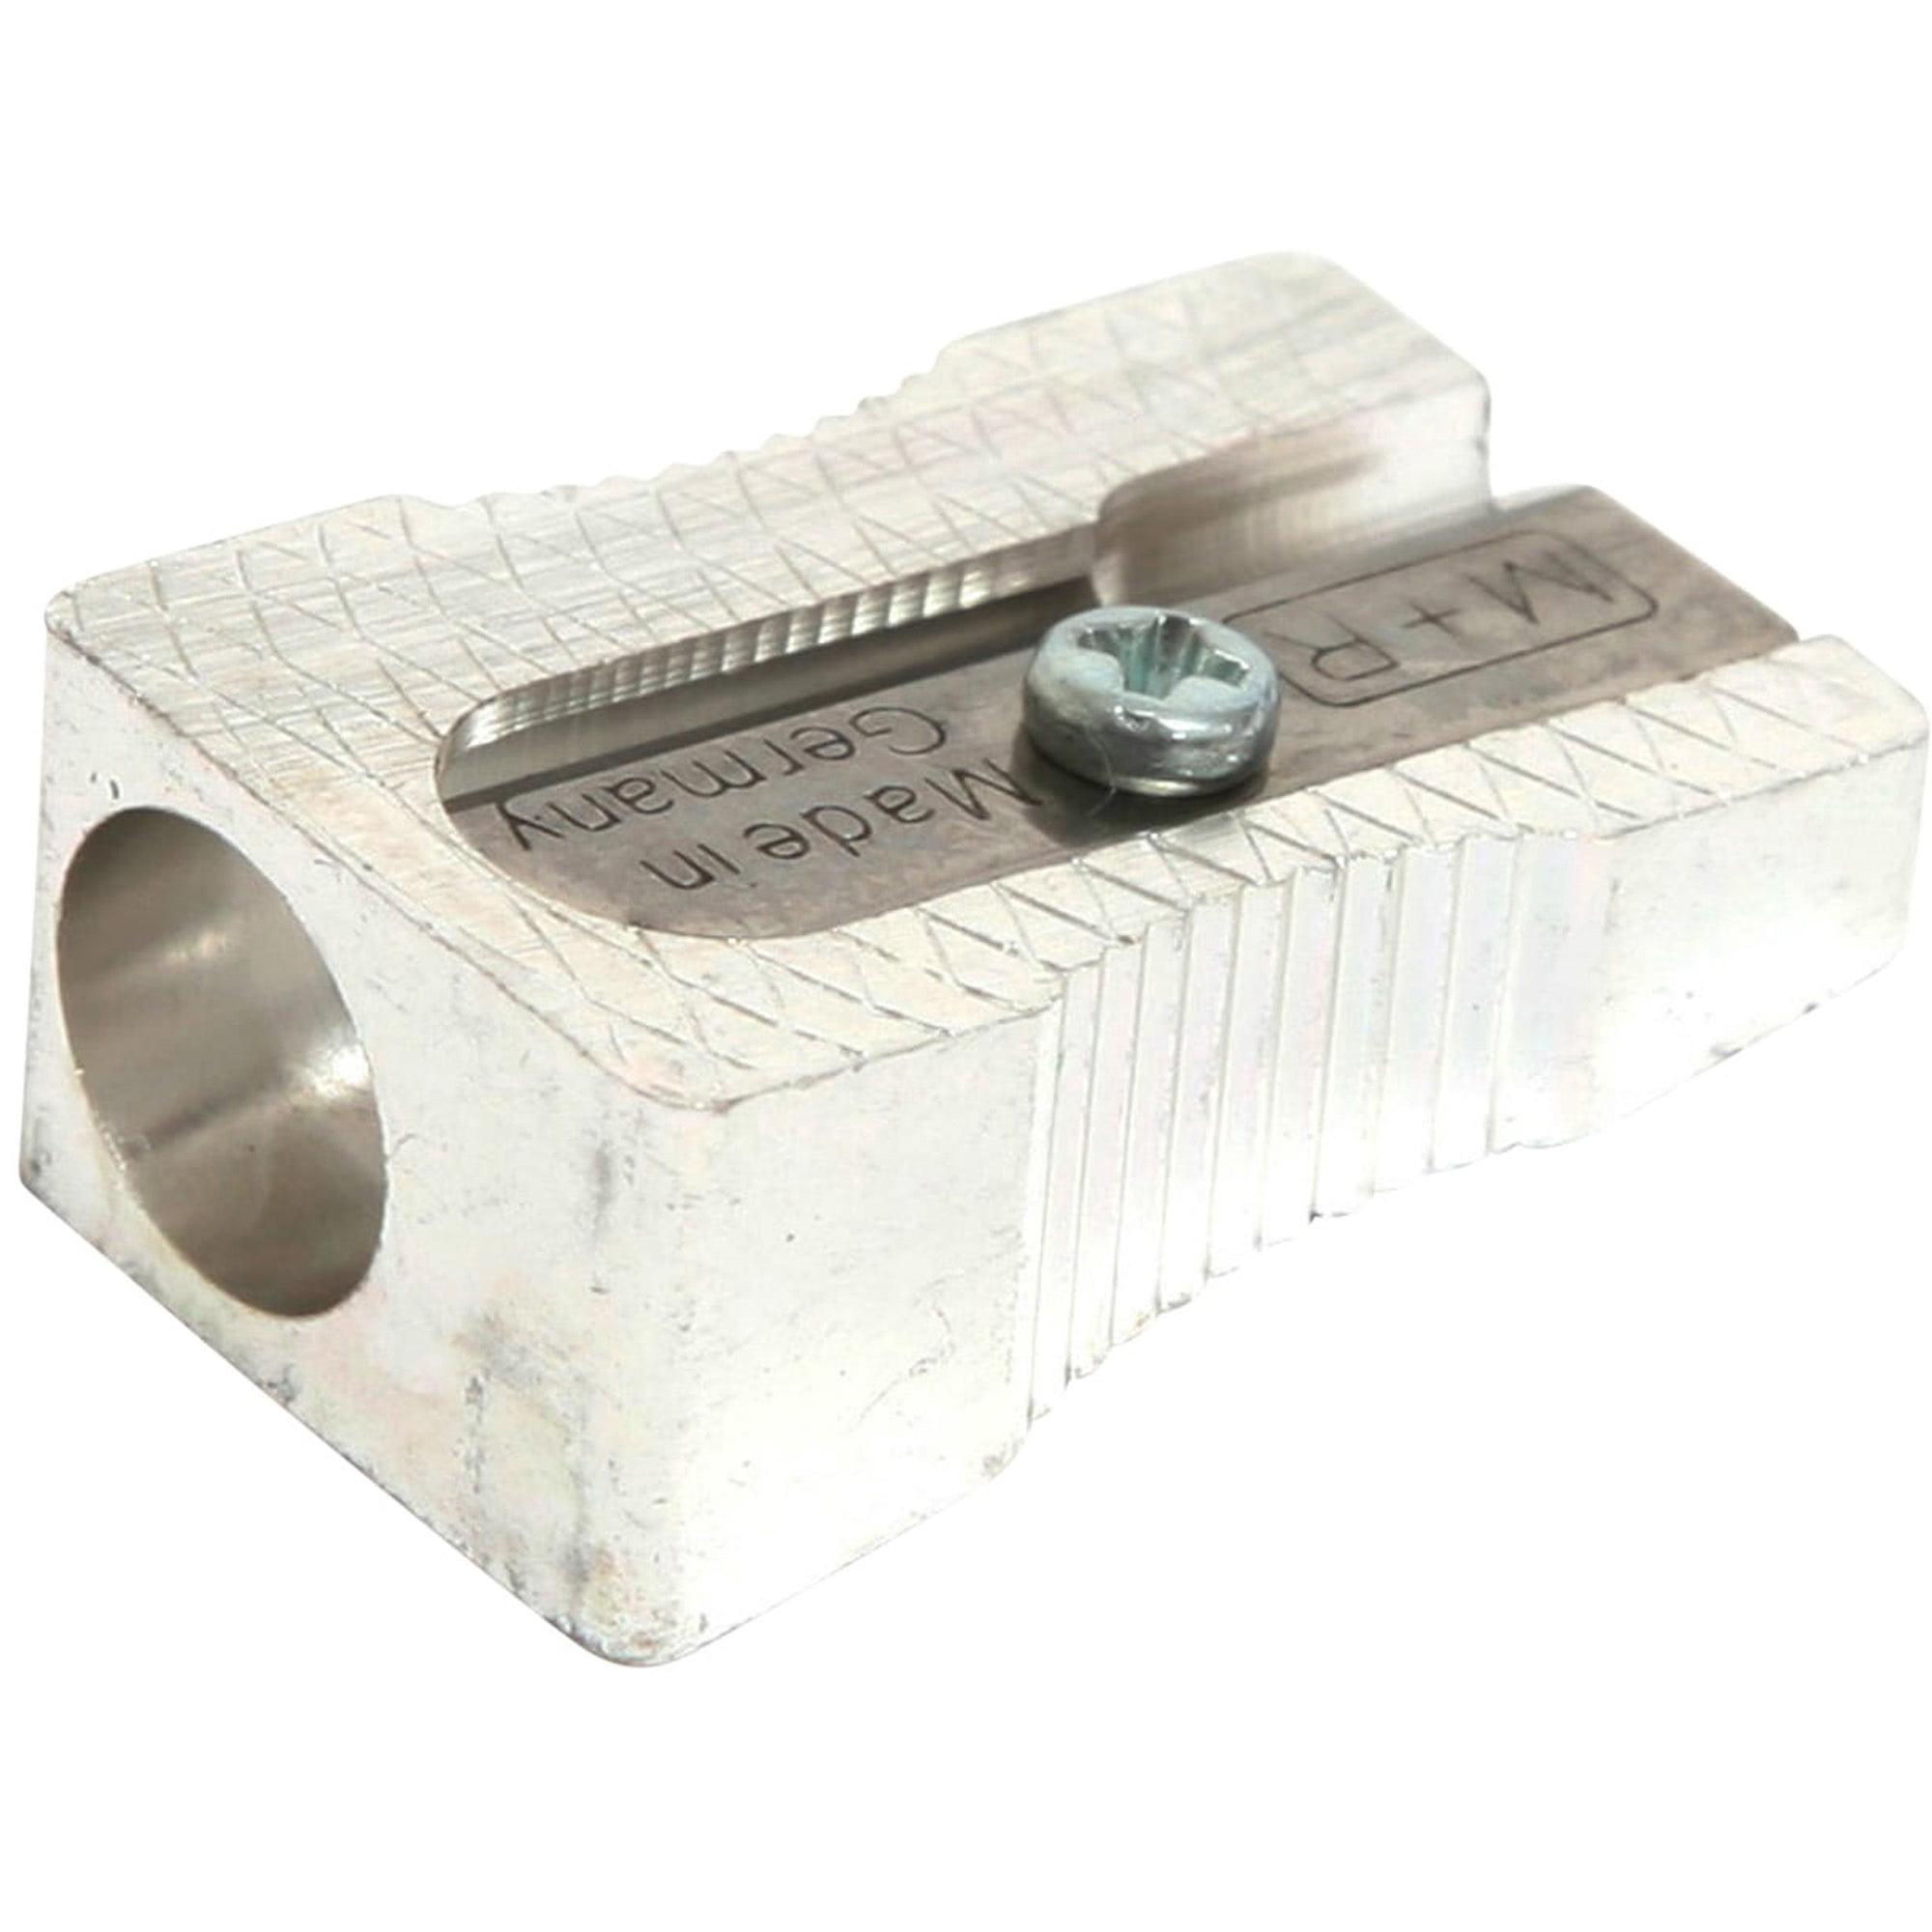 Baumgartens Compact Pencil Sharpener, Silver